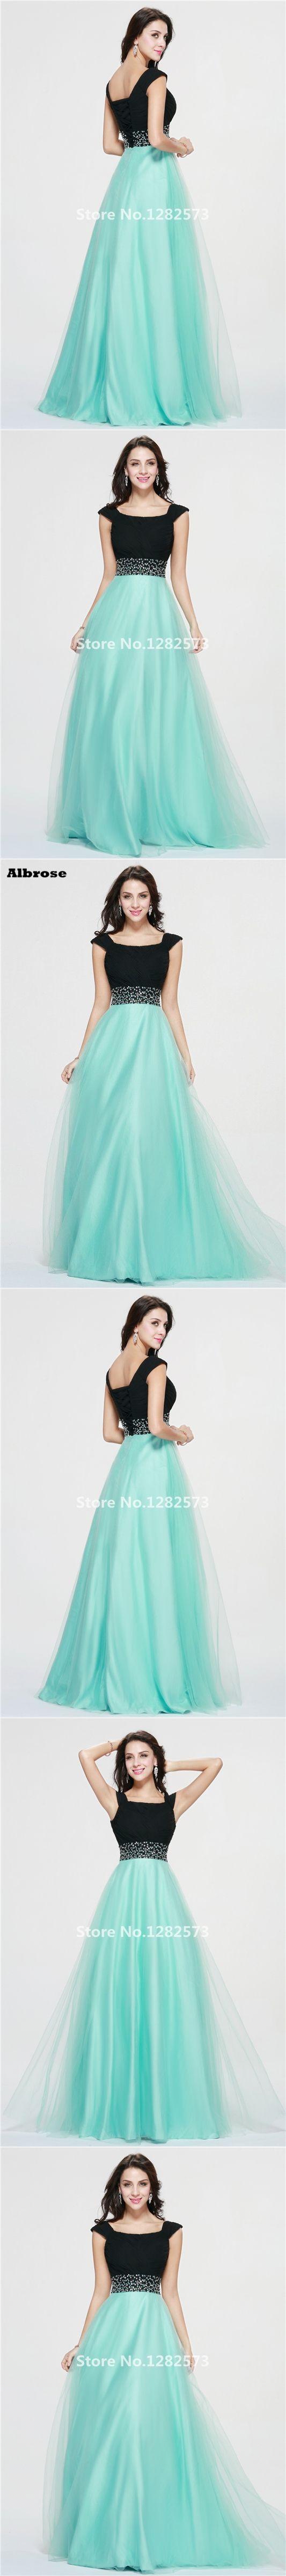 Black and Mint Evening Dress 2017 Cap Sleeve Elegant Evening Dresses Long Tulle robe de soiree Chic vestido de noche abiye